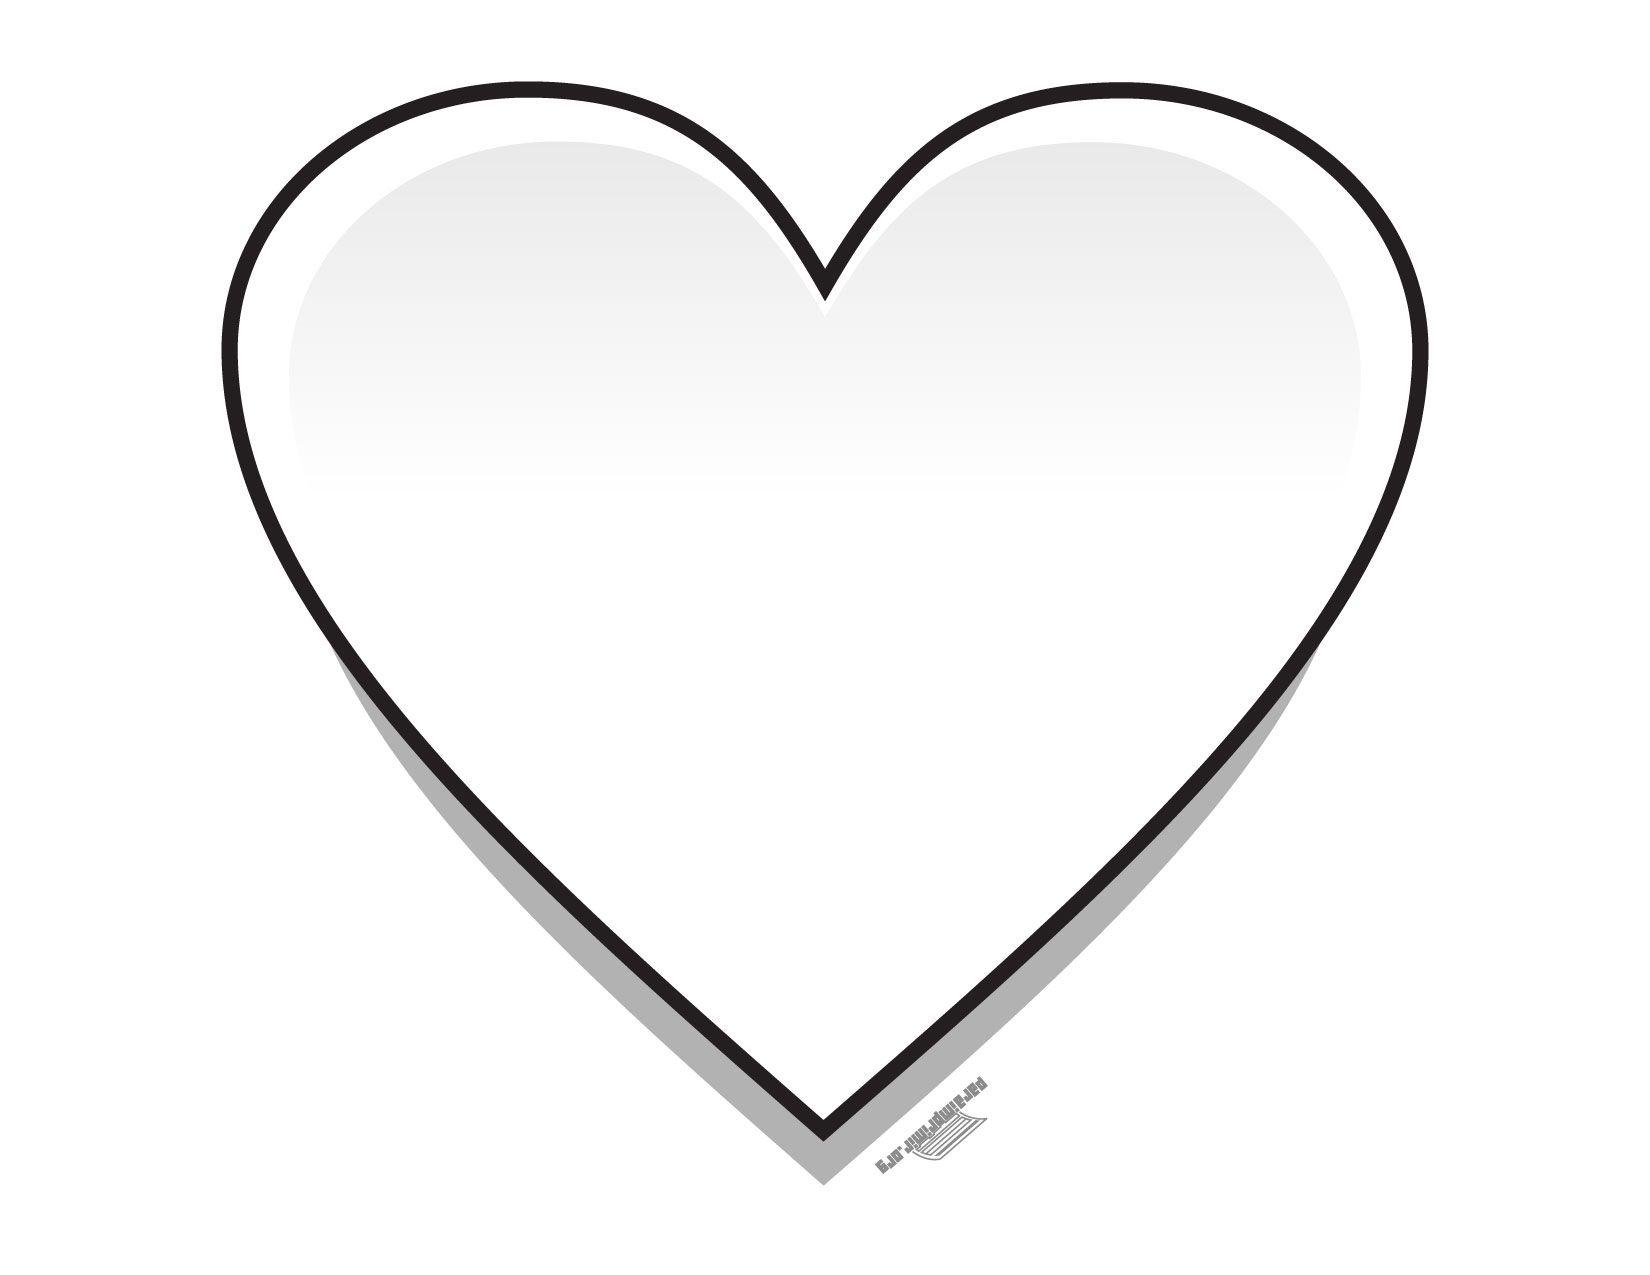 corazon para colorear - Buscar con Google | CORAÇÃO | Pinterest | Tattoo